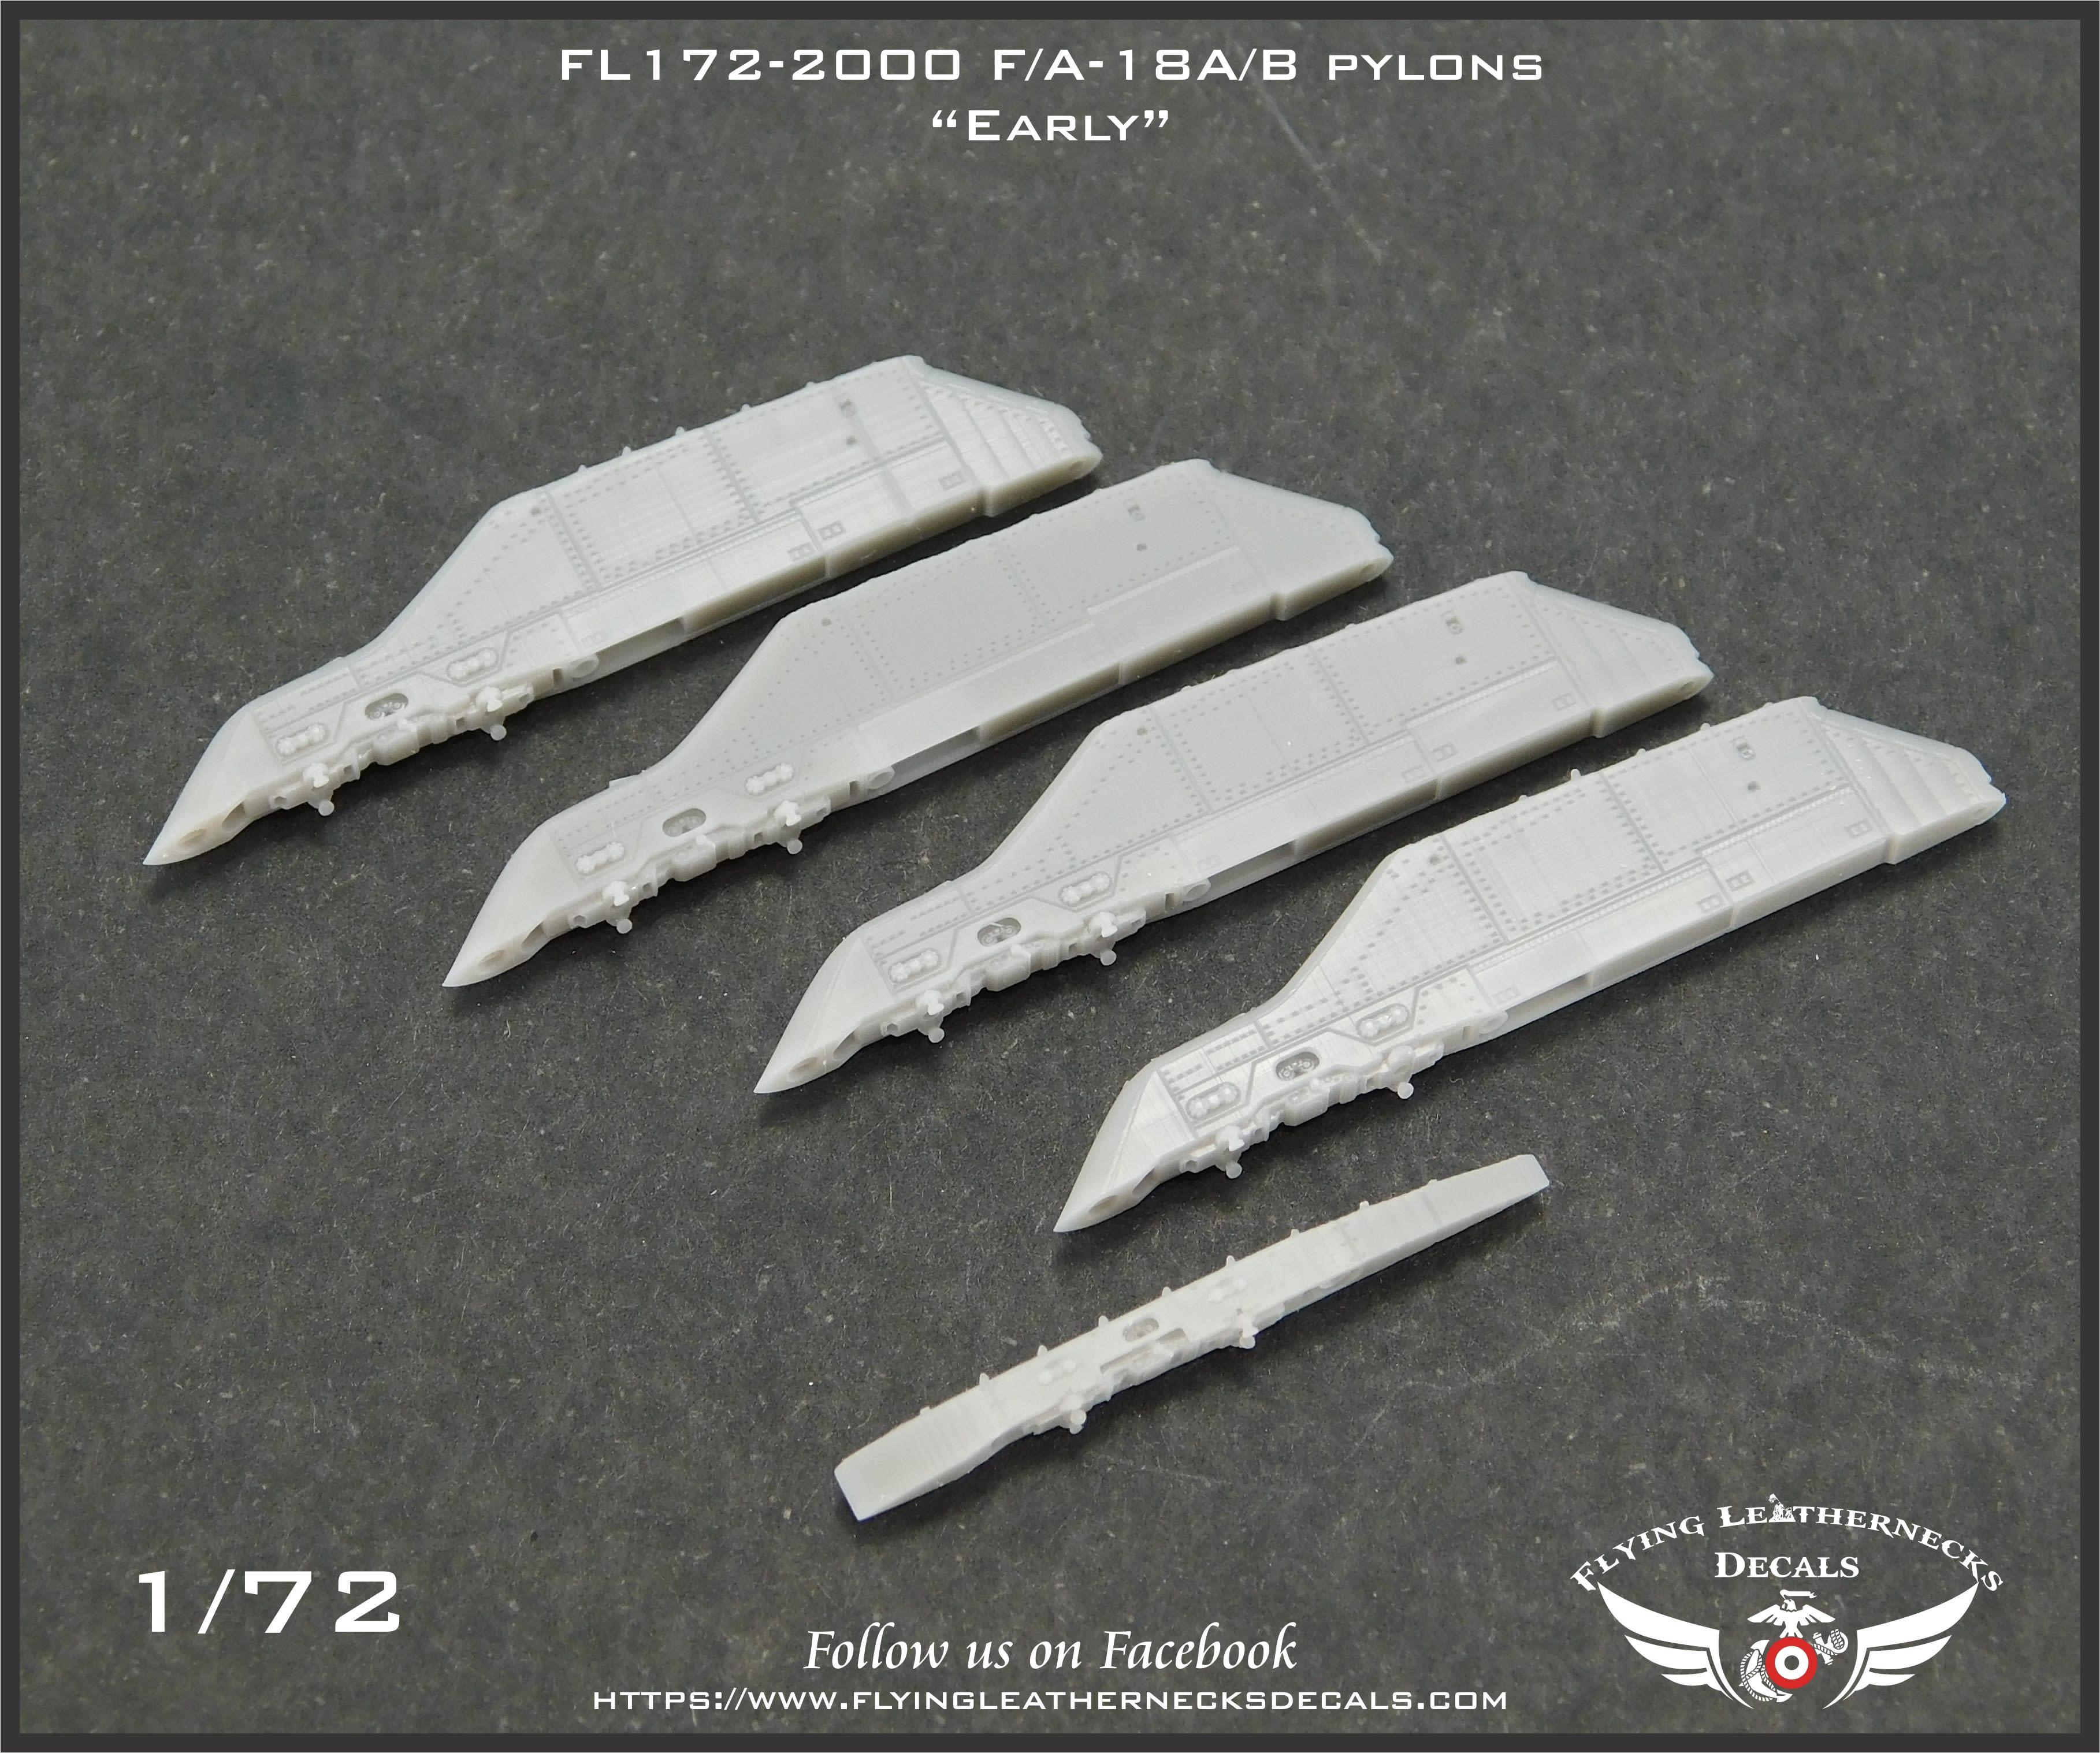 FL172-2000